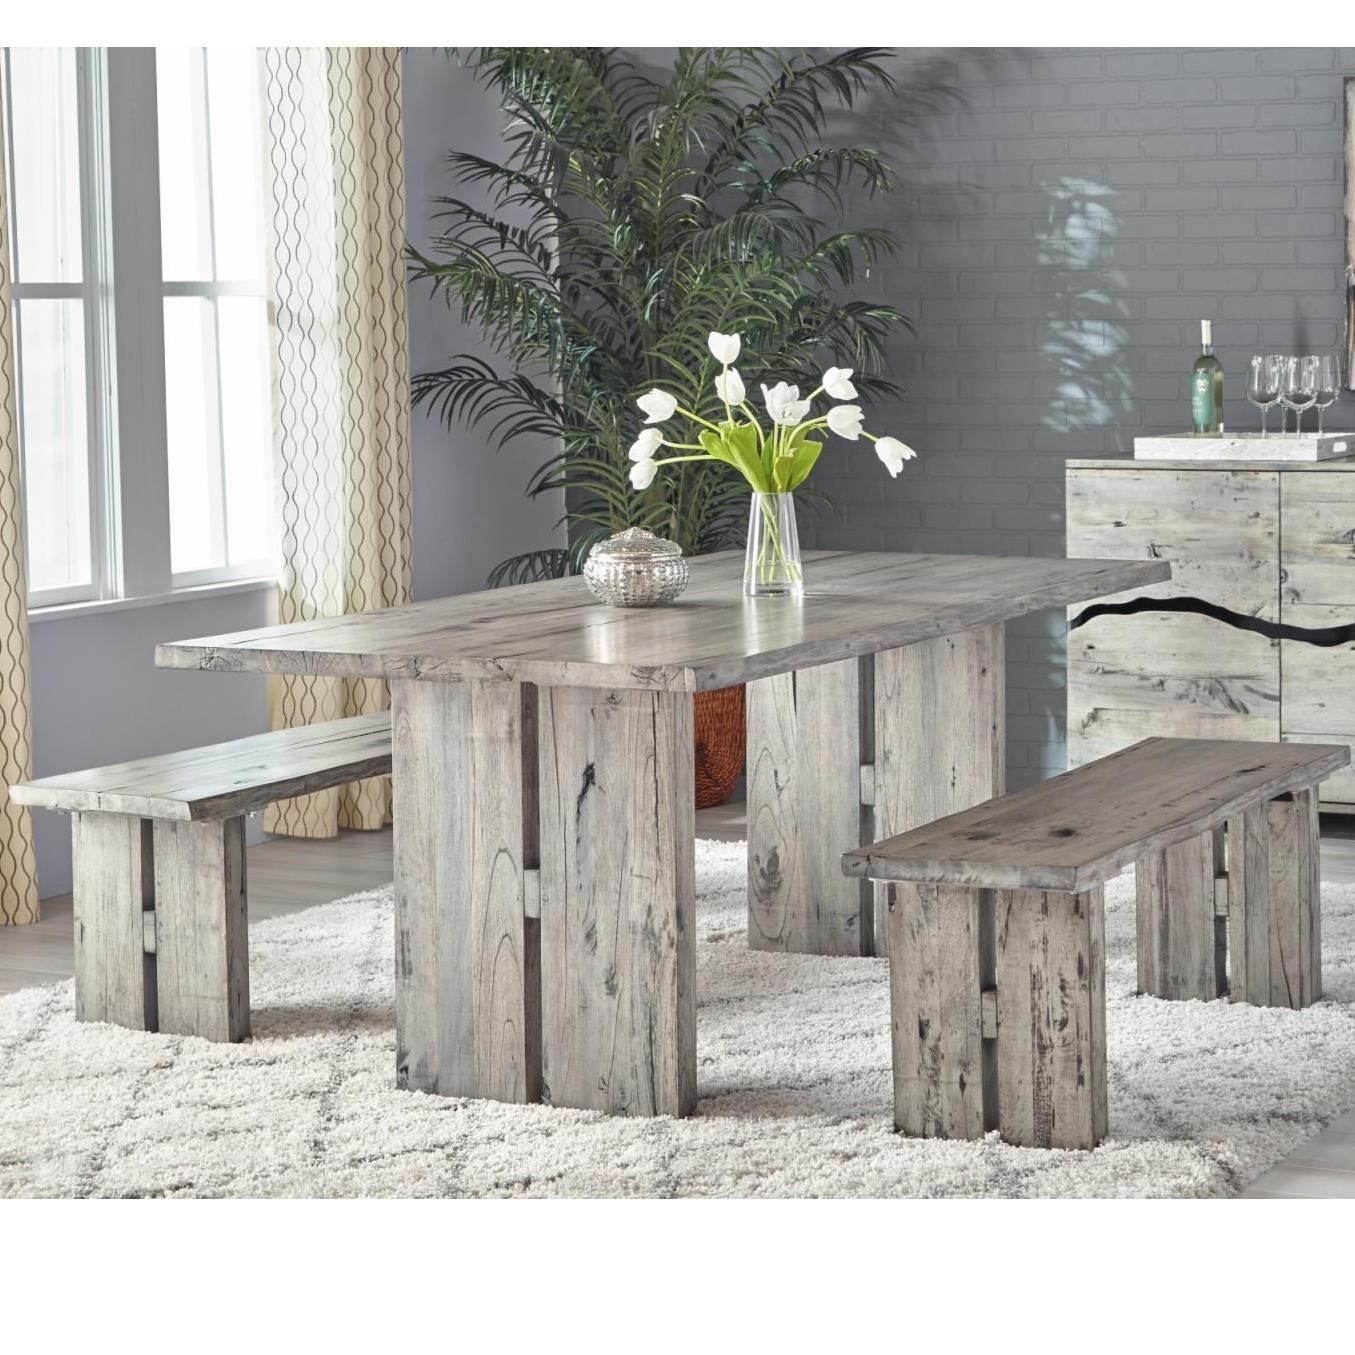 Renewal by Napa Dining Table and Bench Set by Napa Furniture Designs at Johnny Janosik